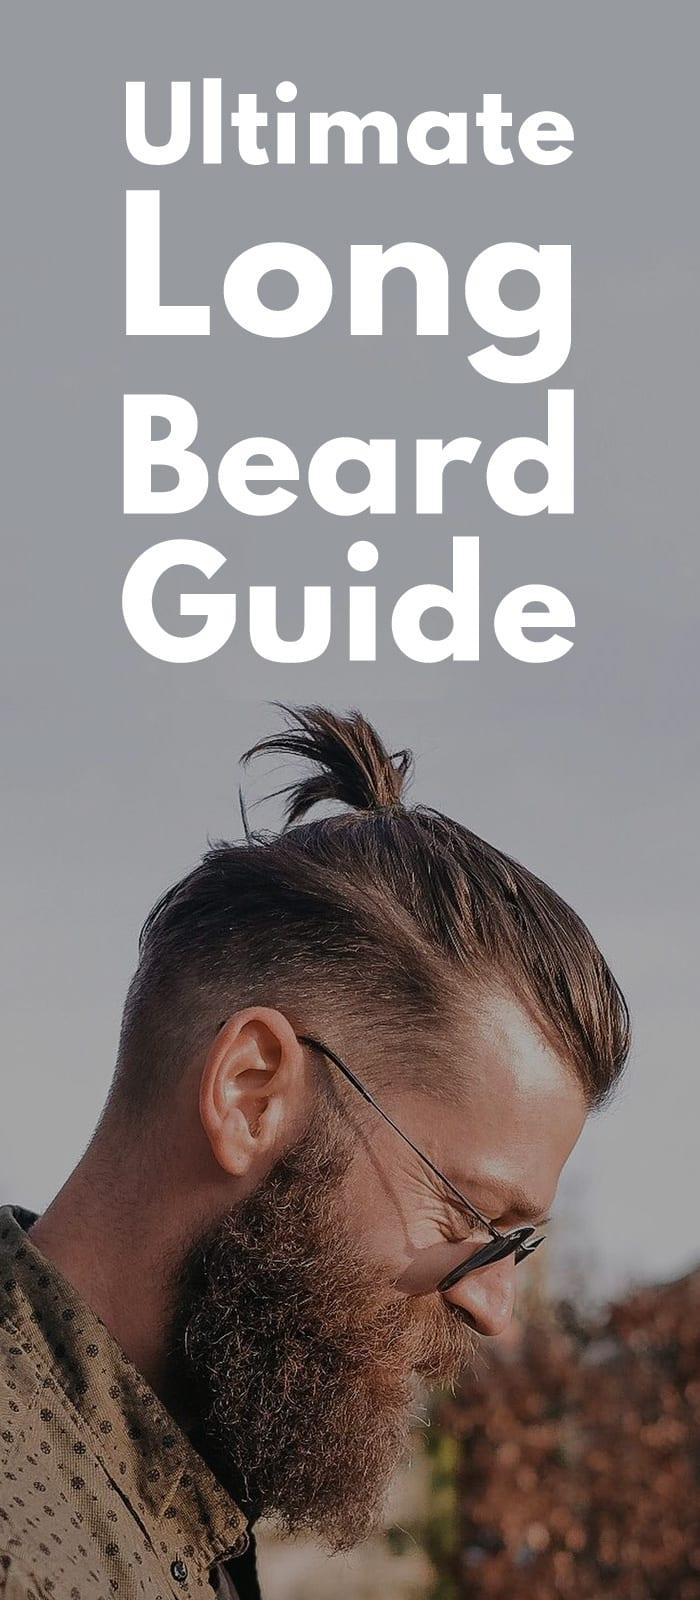 Ultimate Long Beard Guide